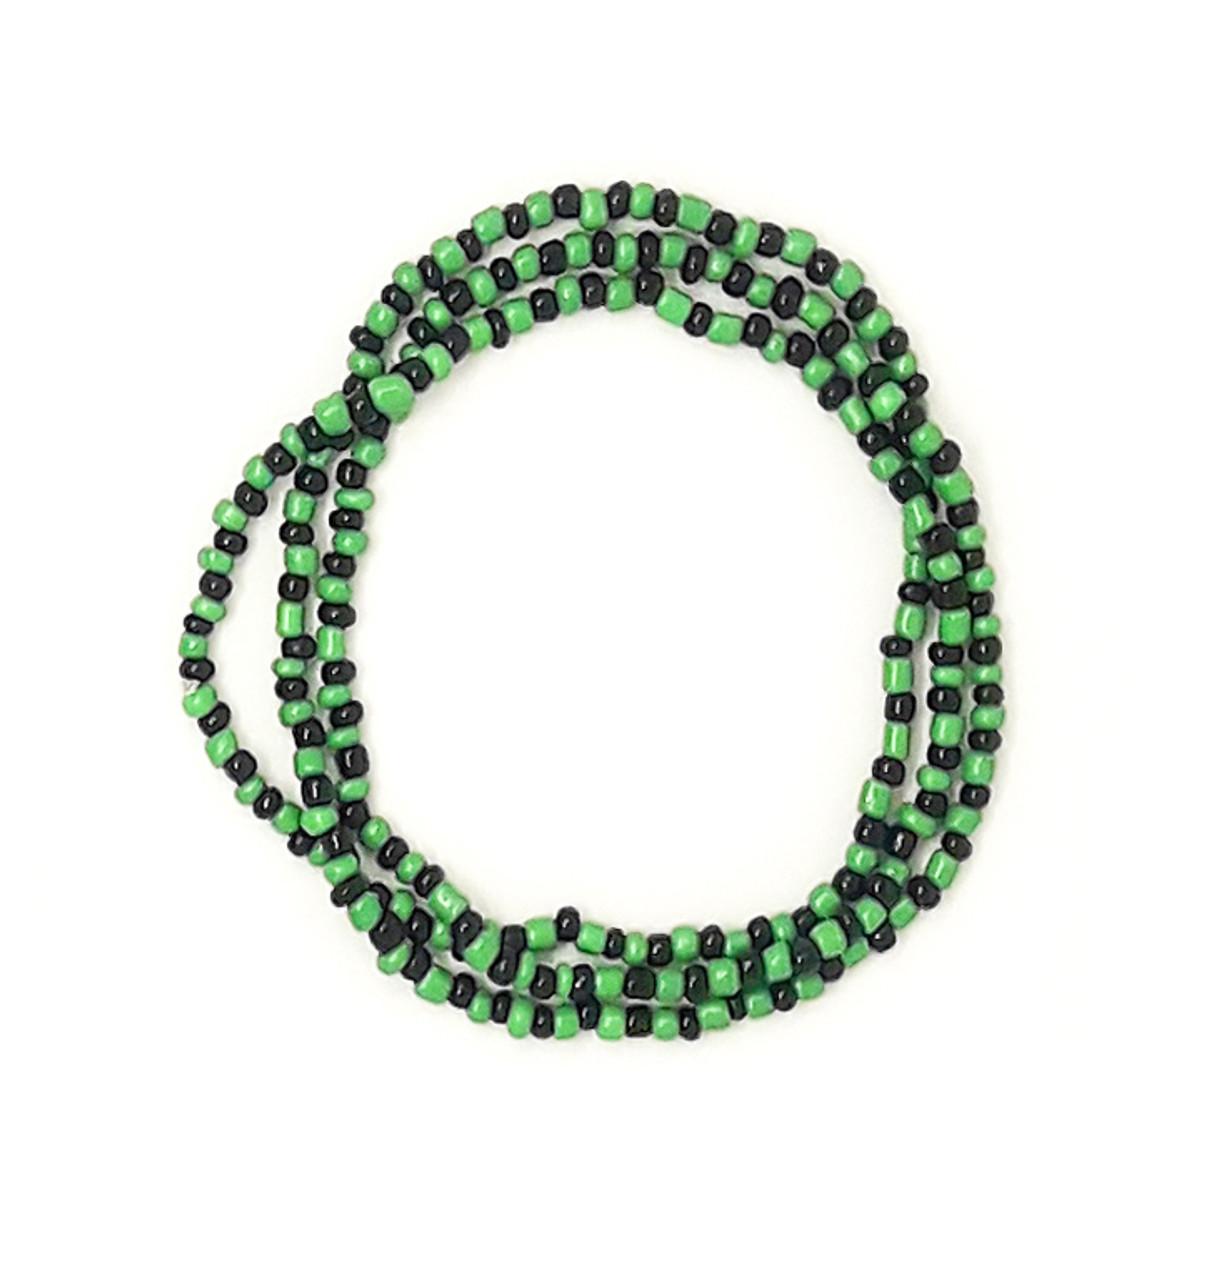 Collar De Ogun - Glass Beaded Necklace